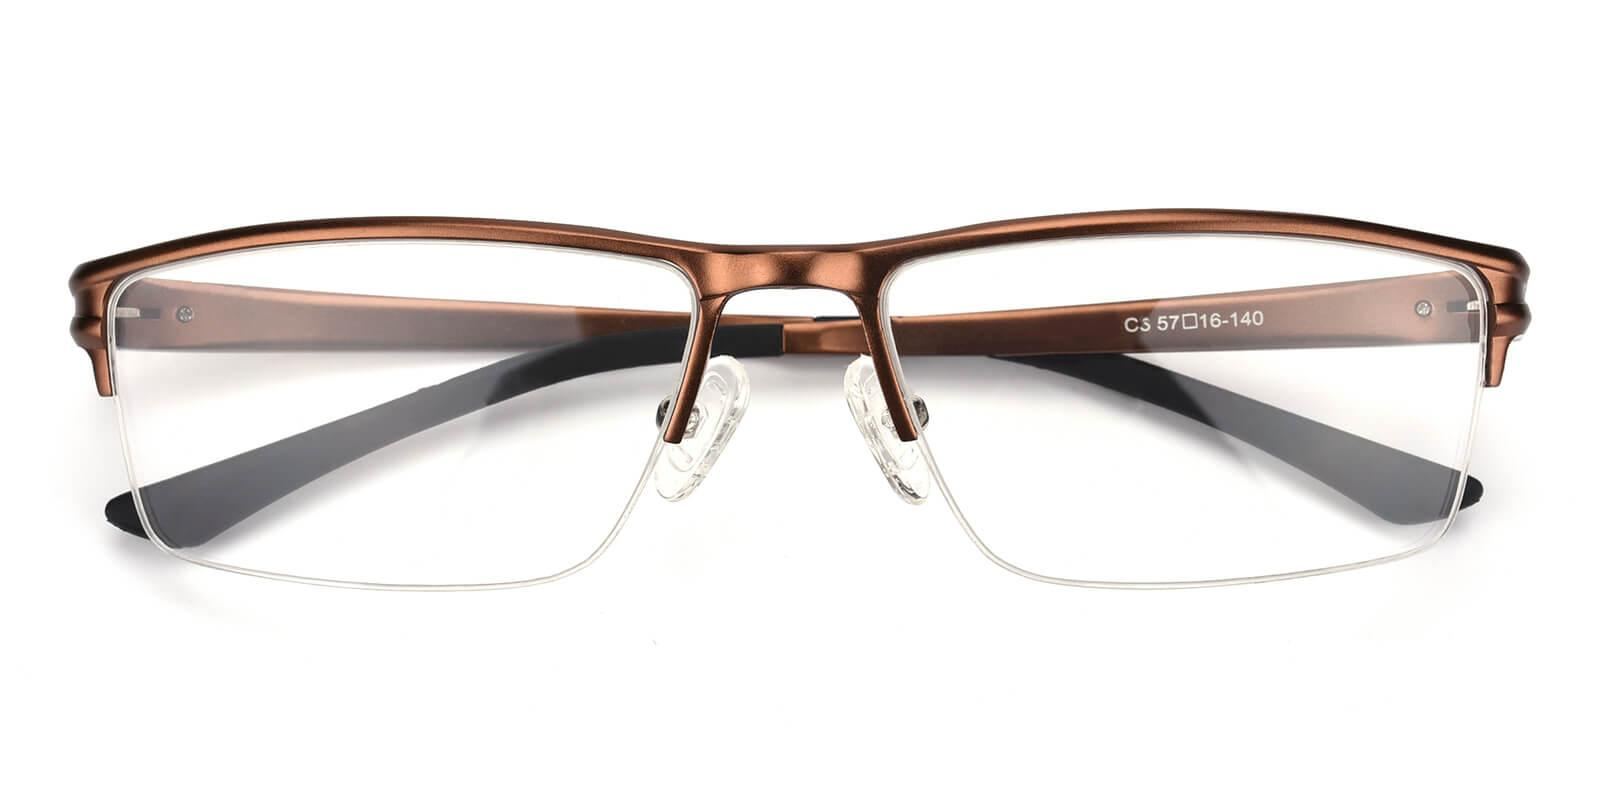 Leonado-Brown-Rectangle-Metal-Eyeglasses-detail